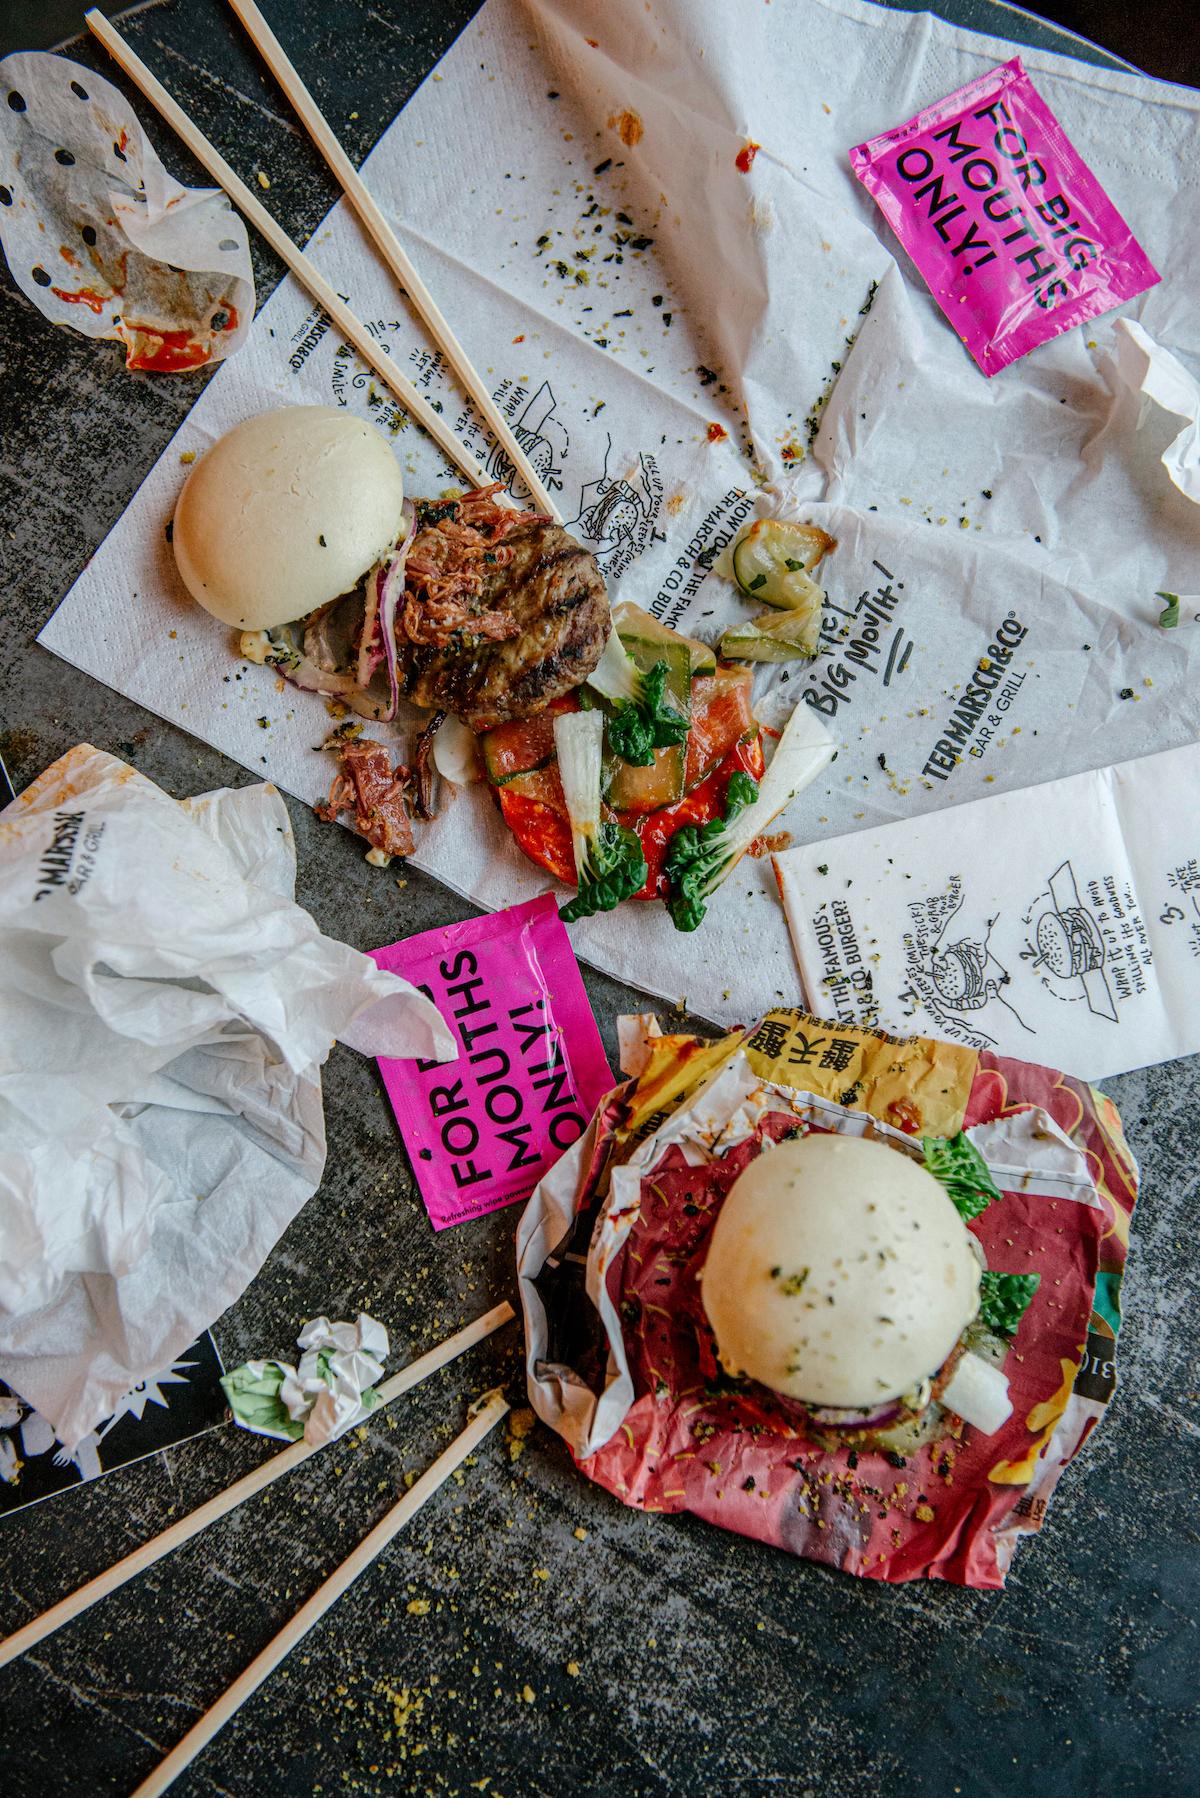 Lekkerste hamburger van Nederland